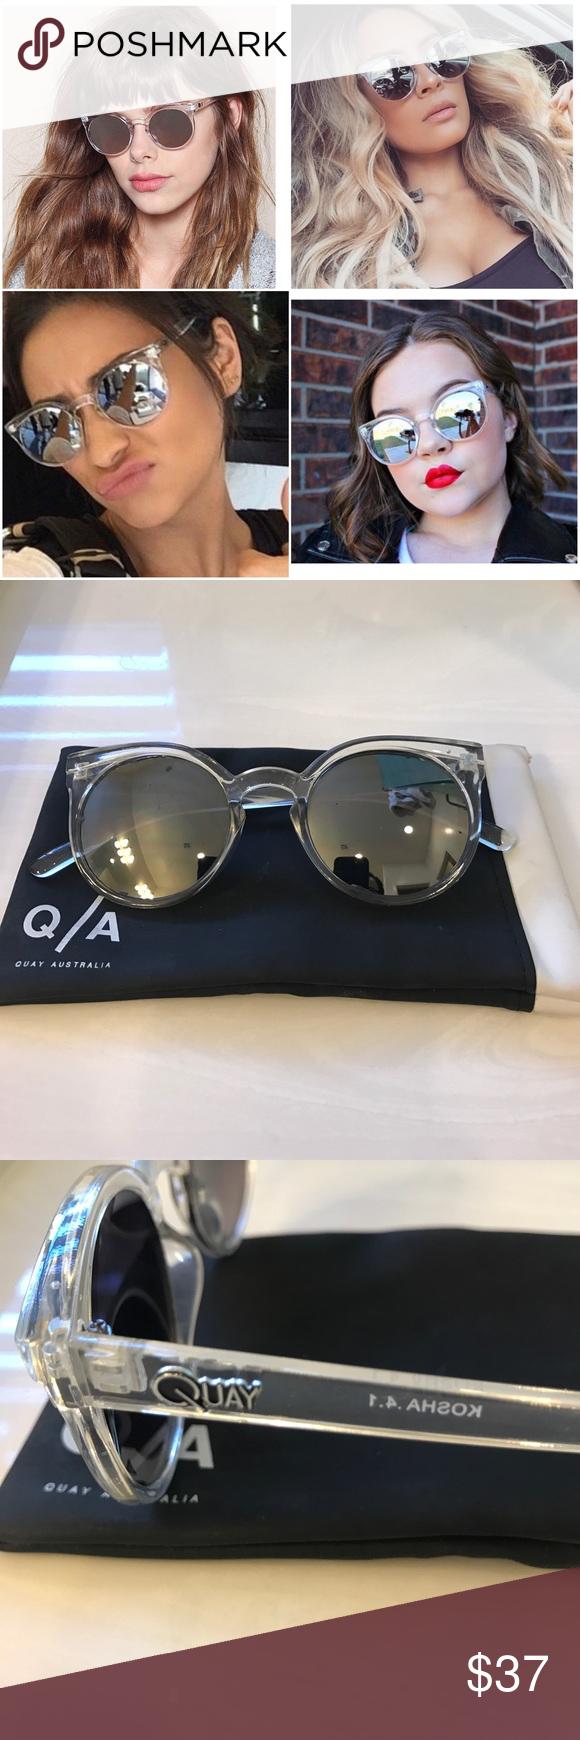 Quay Sunglasses   Quay sunglasses, Sunglasses, Sunglasses